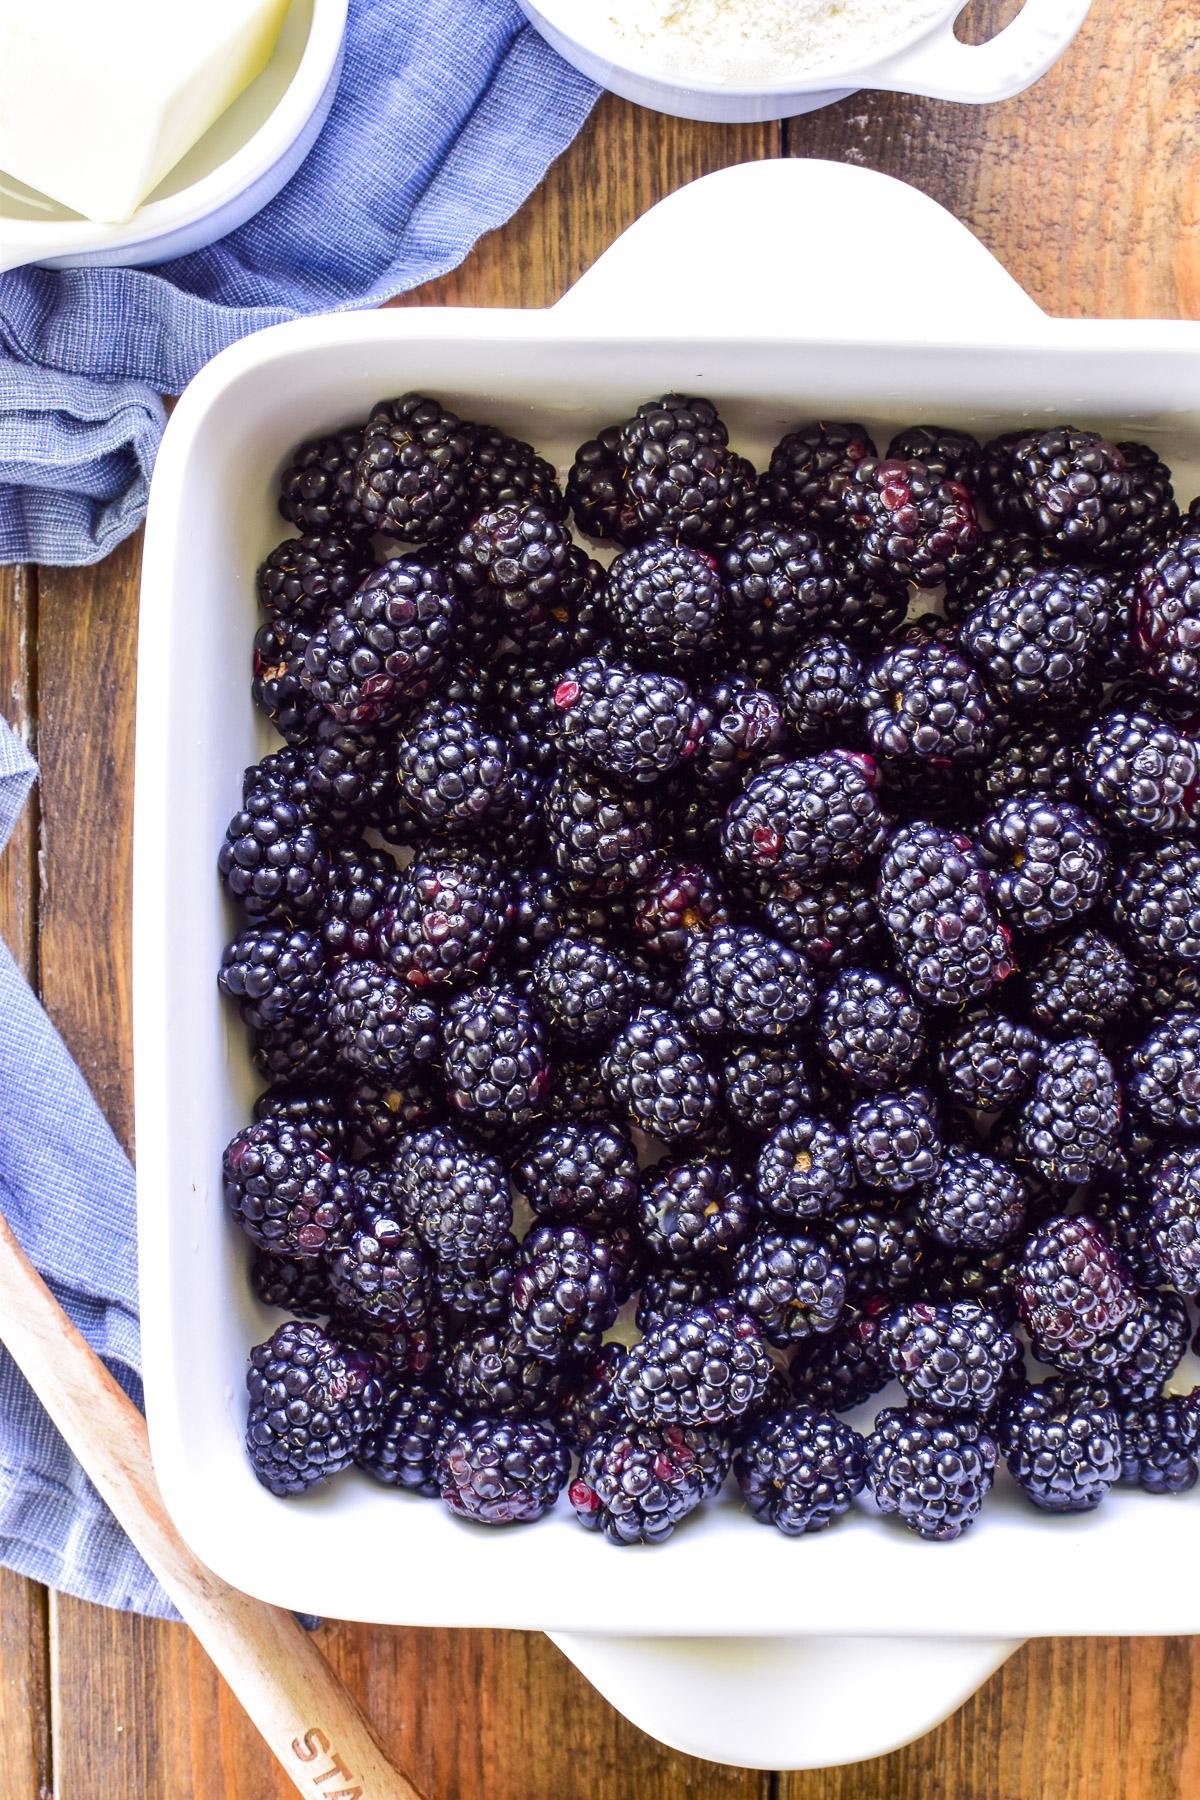 Fresh blackberries in white baking pan